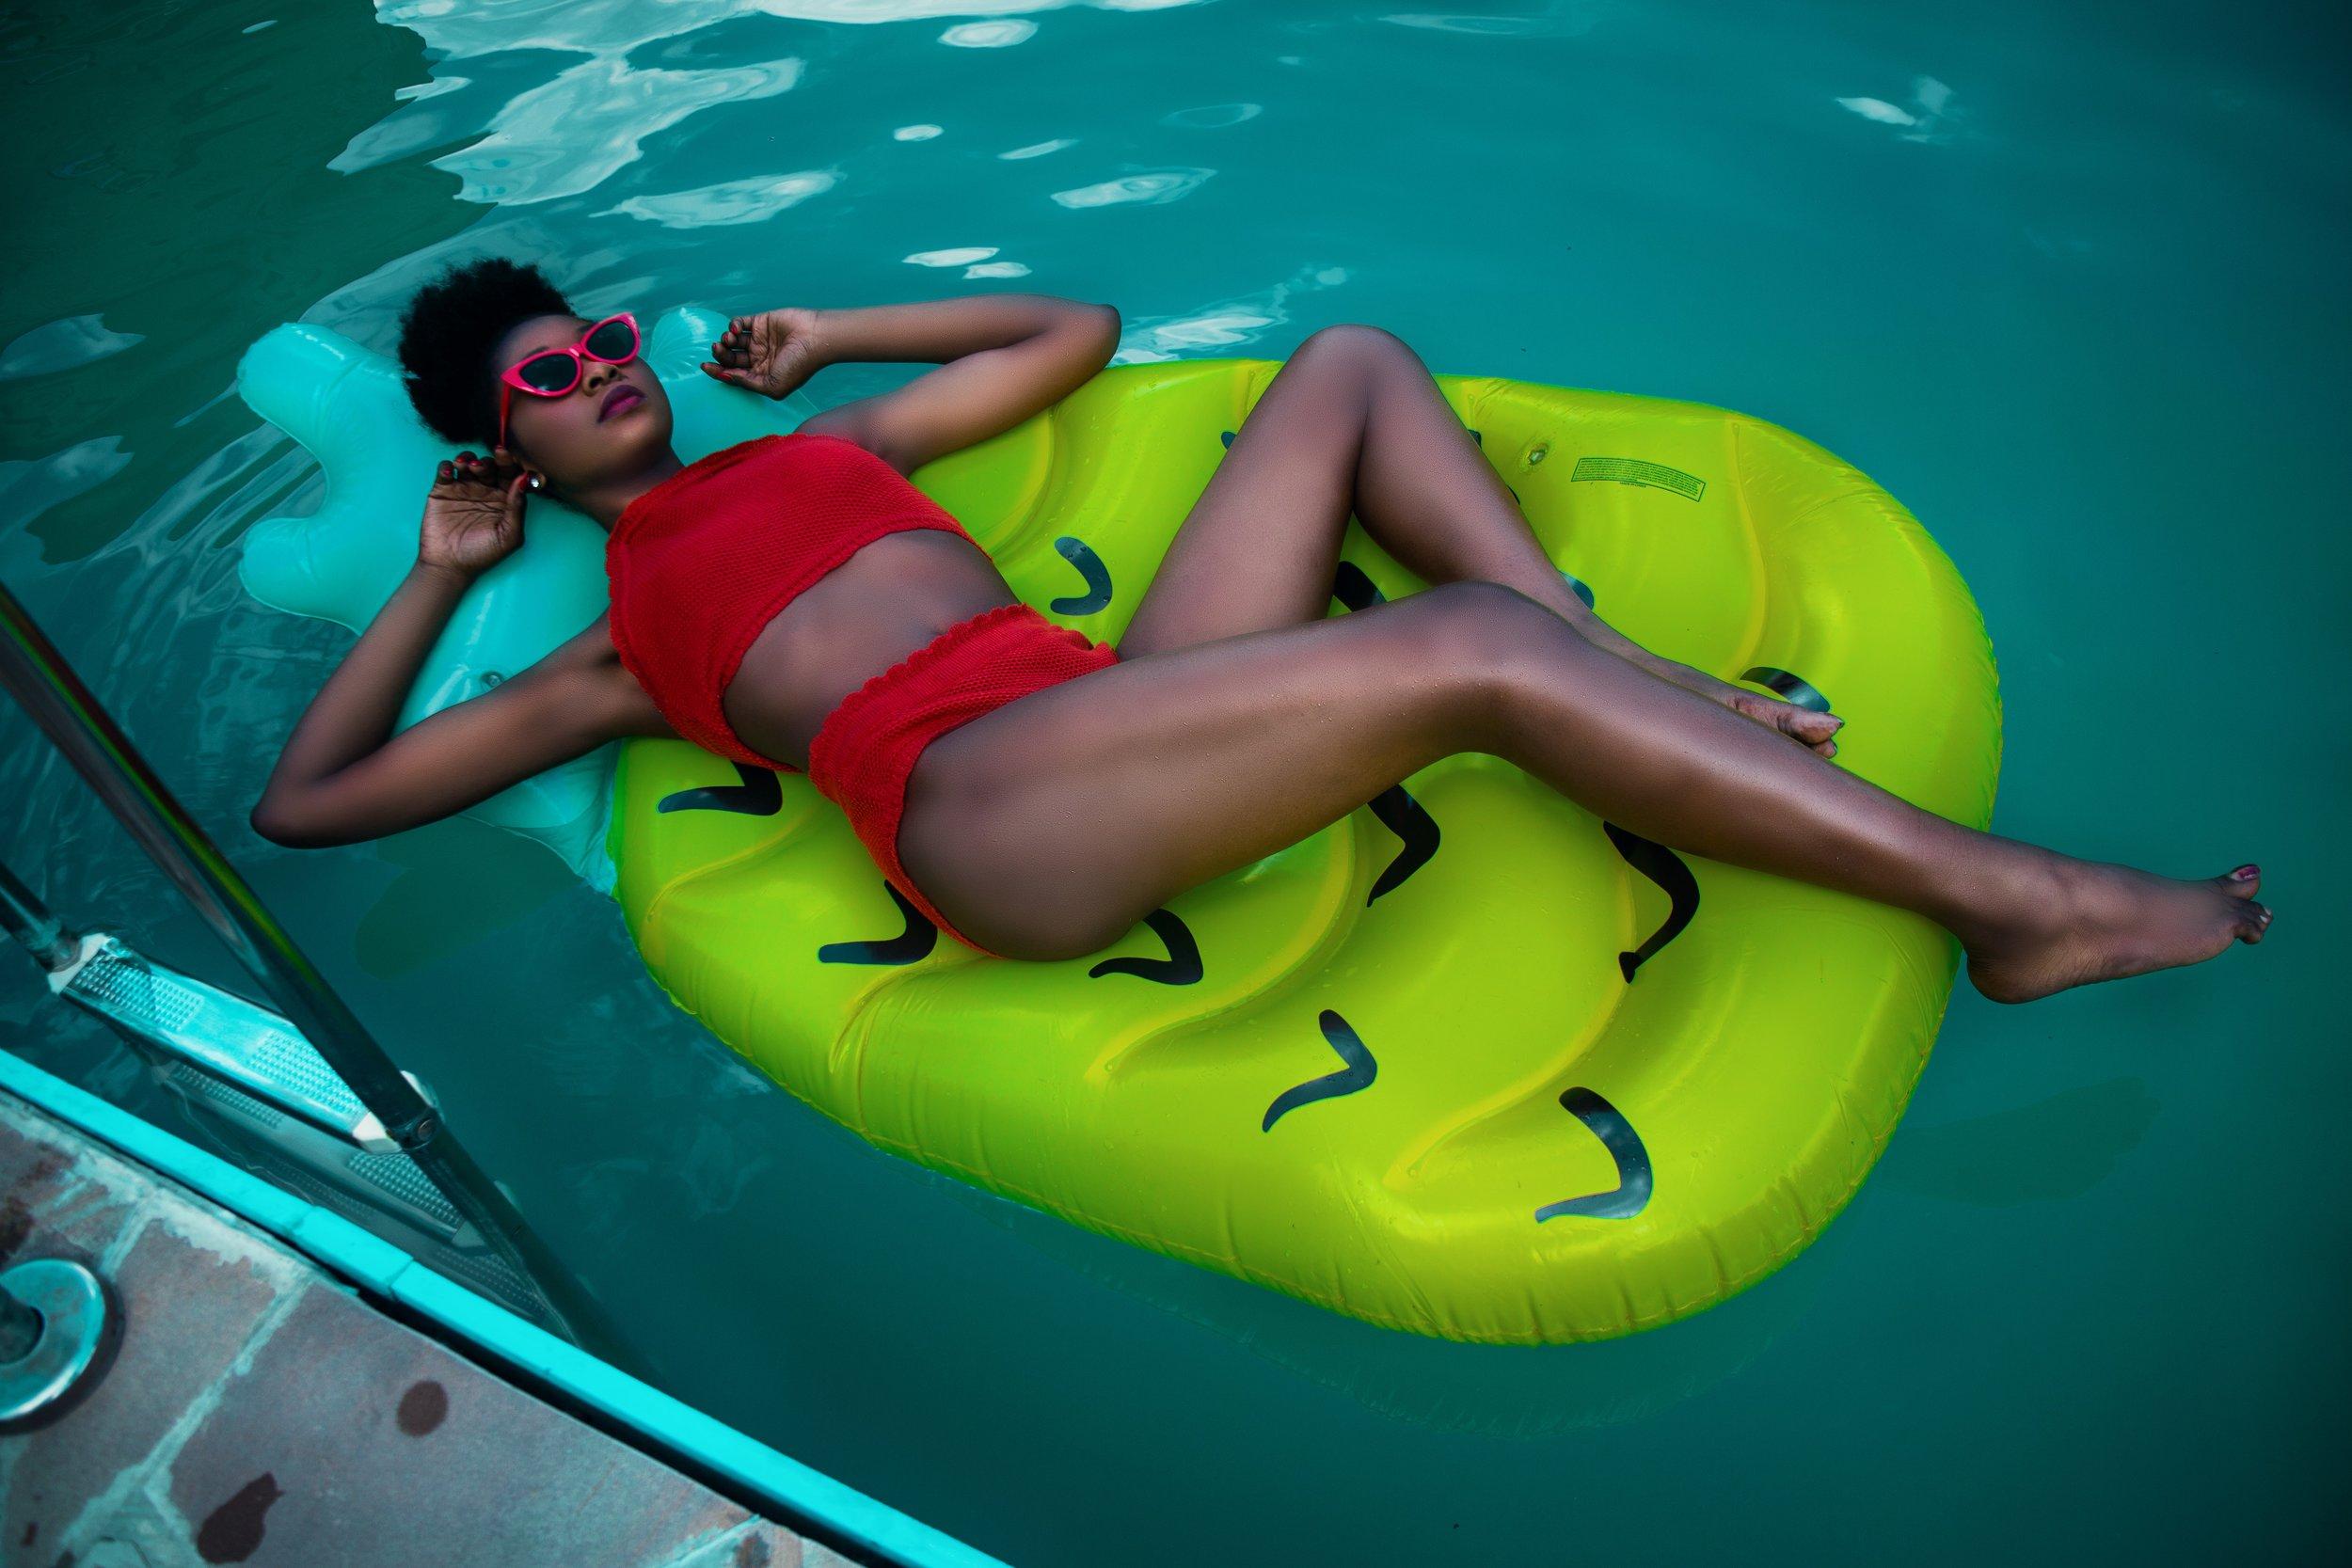 adult-bikini-body-756559.jpg